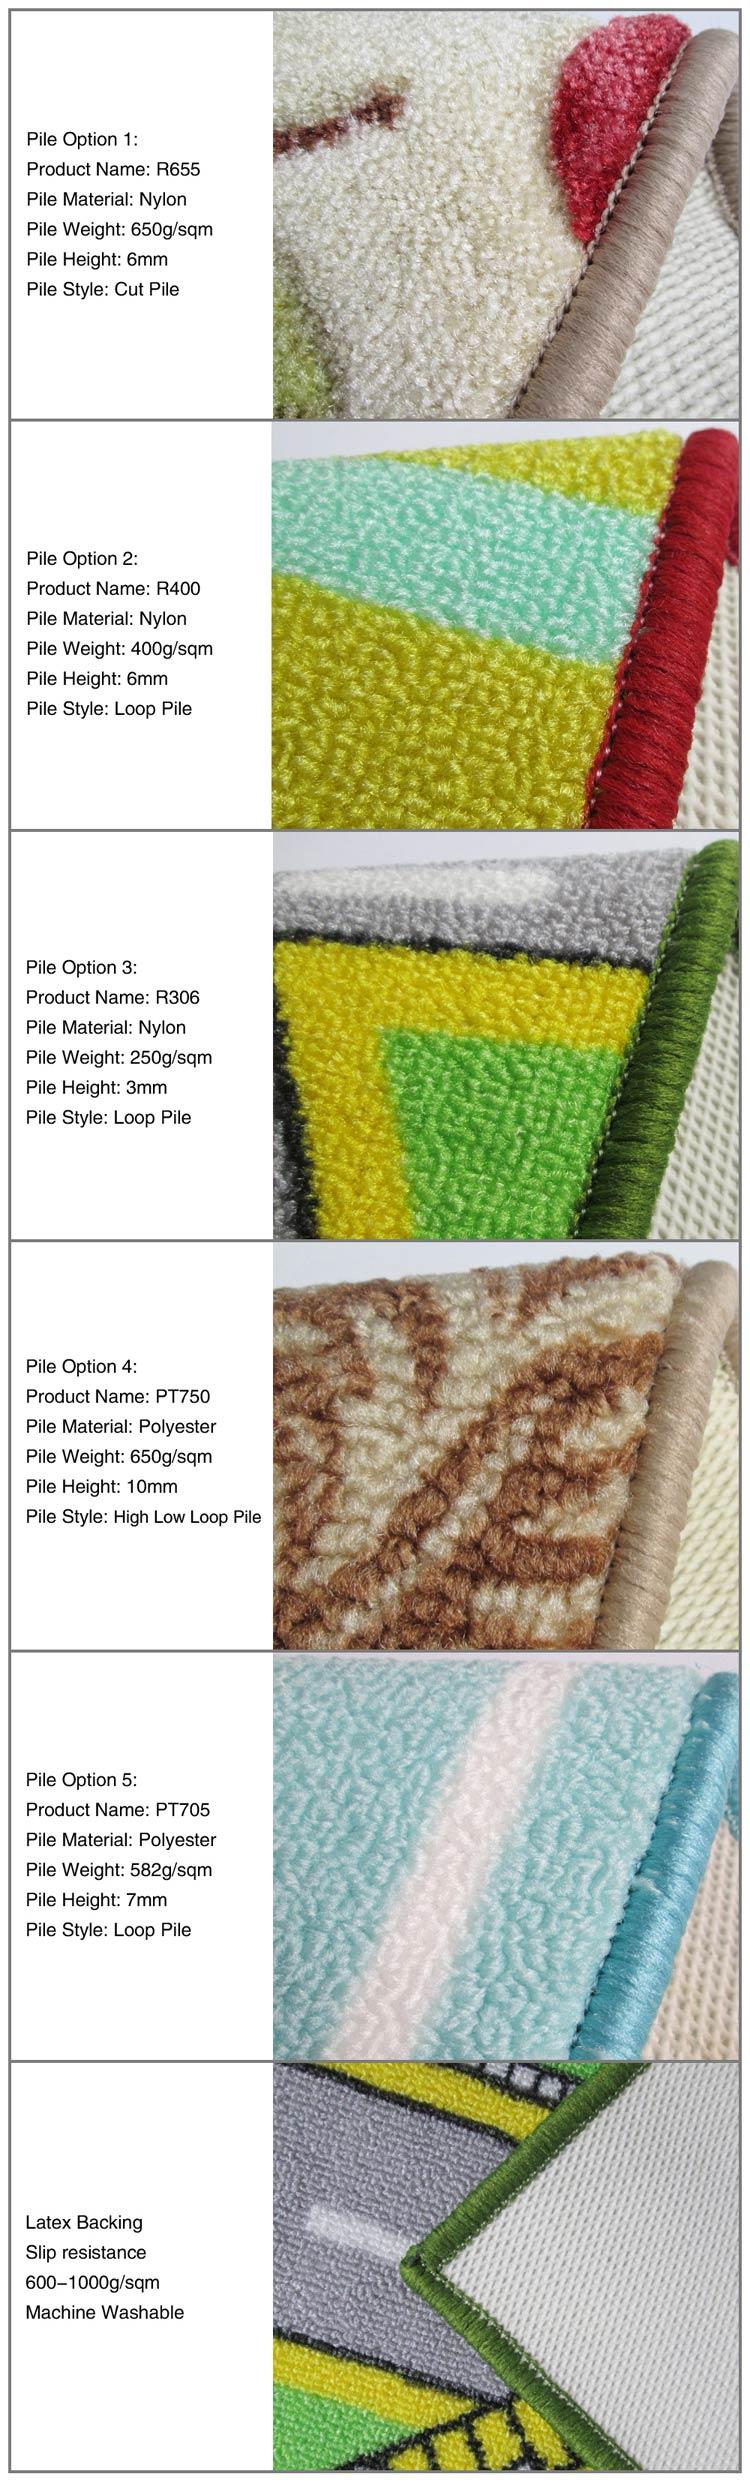 Anti Slip Dust Control Mat Carpet for Sale